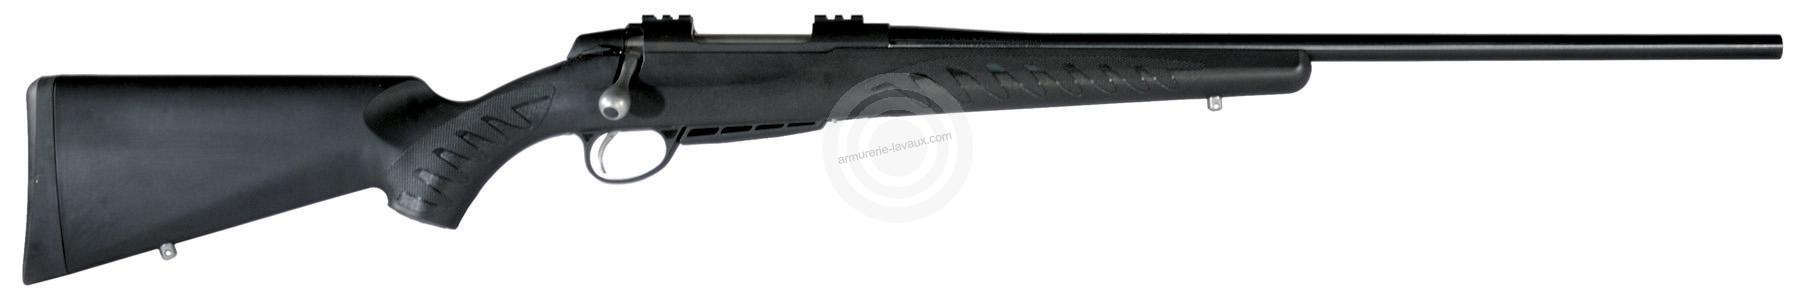 Carabine SAKO A7 Synthétique Noir